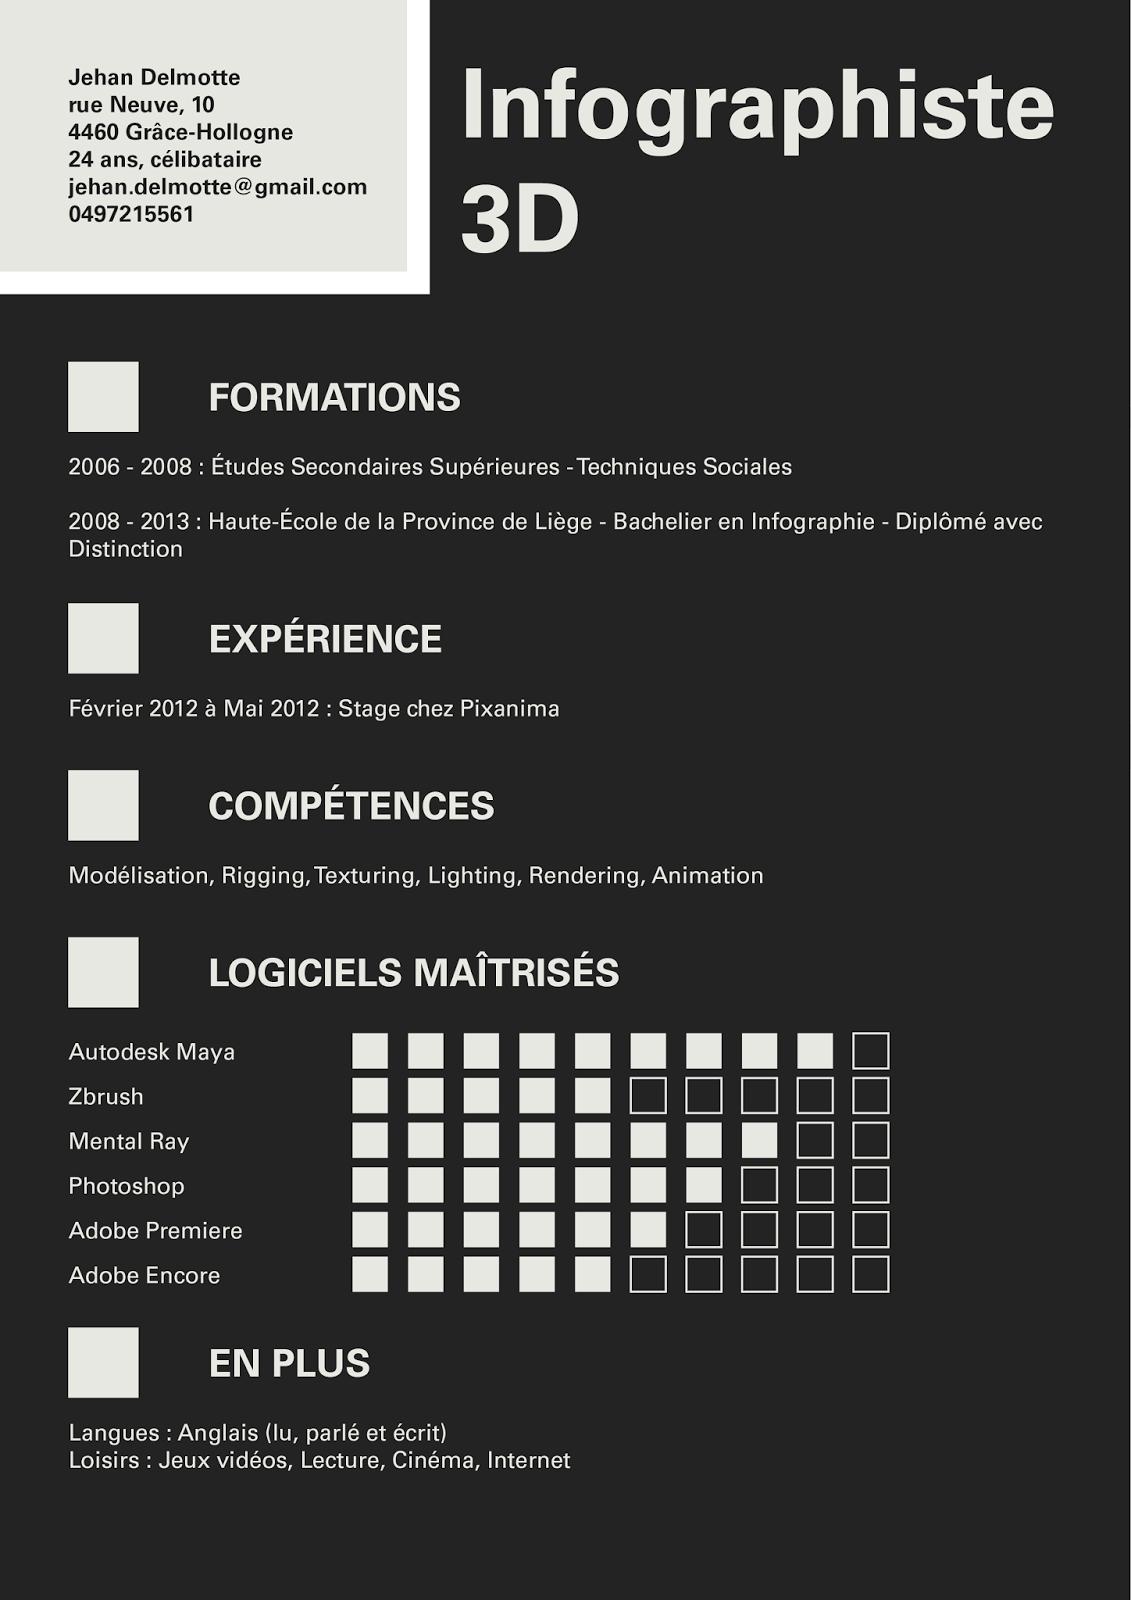 exemple cv infographiste 3d